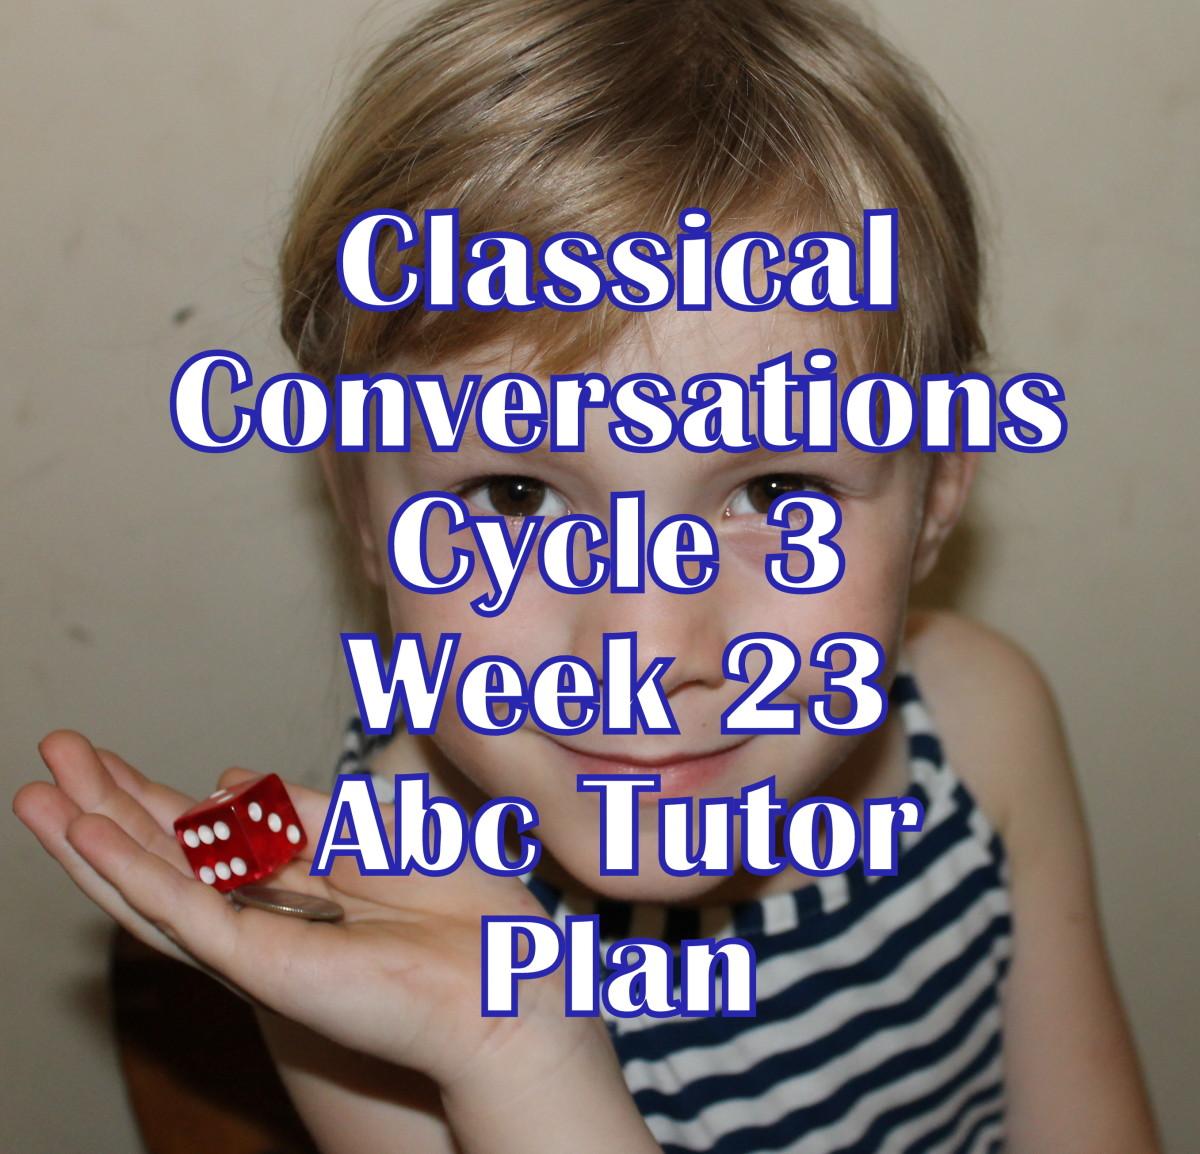 Classical Conversations CC Cycle 3 Week 23 Lesson for Abecedarians - CC C3W23